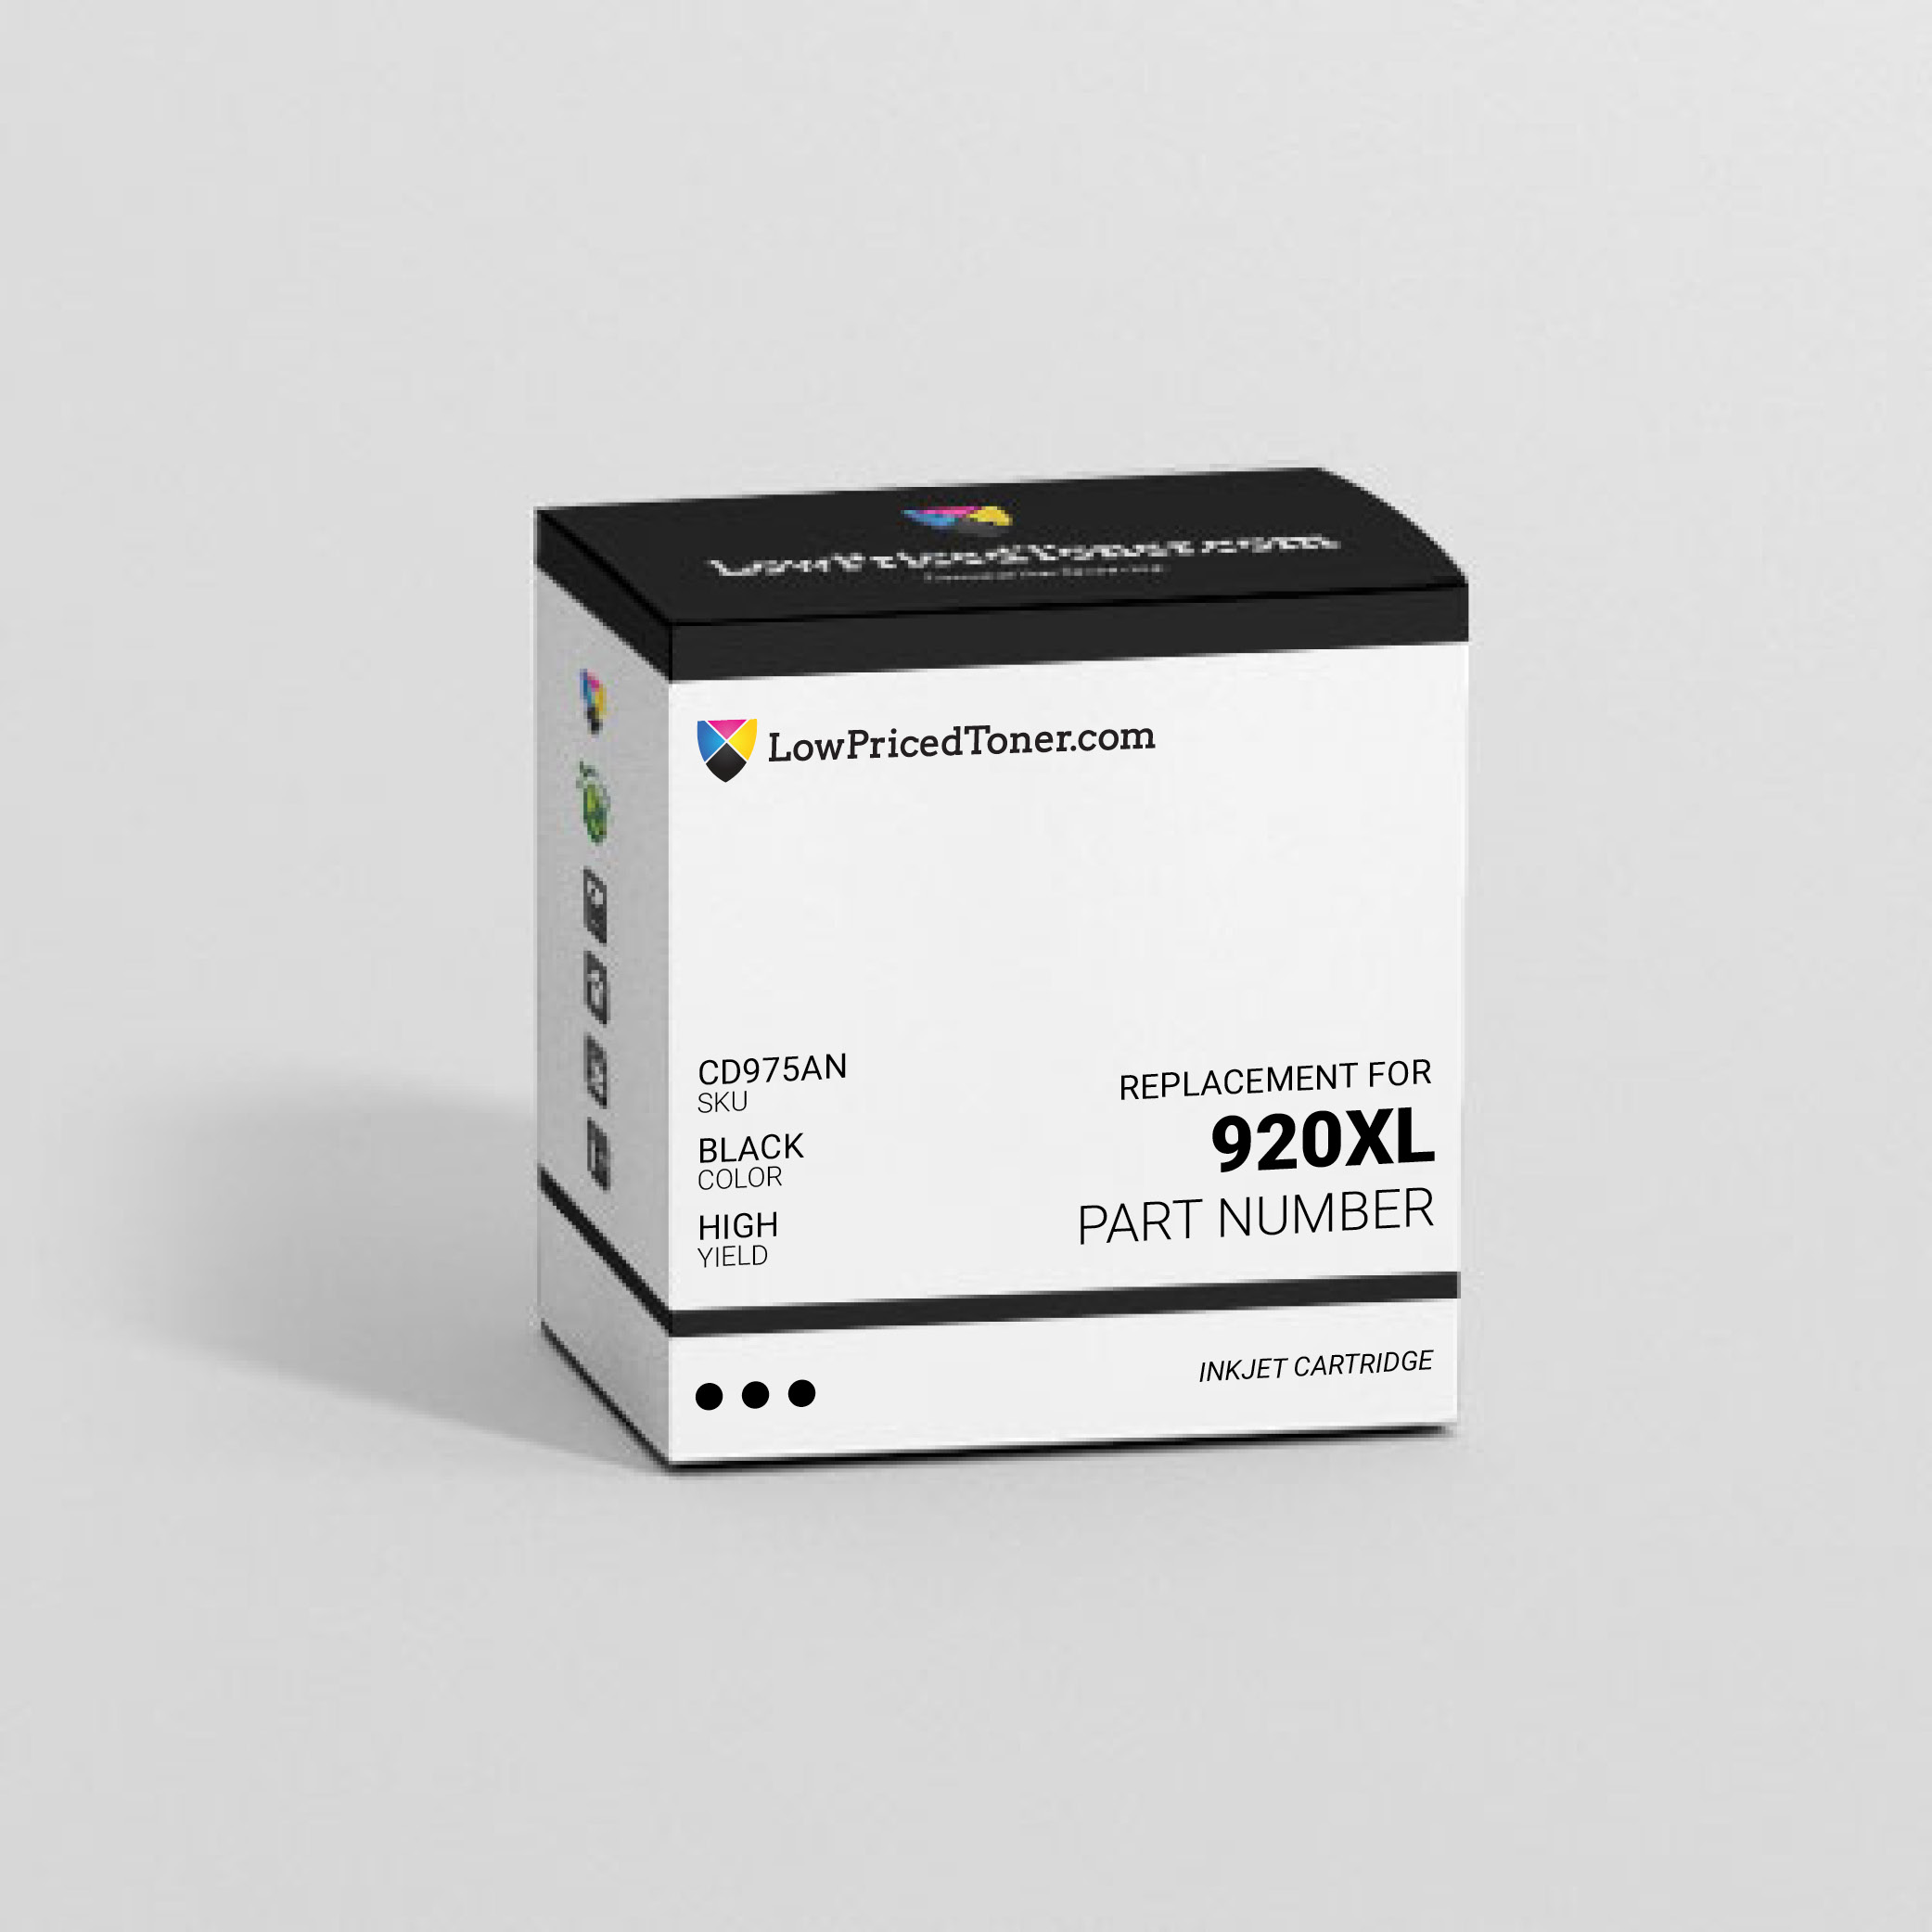 HP CD975AN 920XL Remanufactured Black Ink Cartridge High Yield